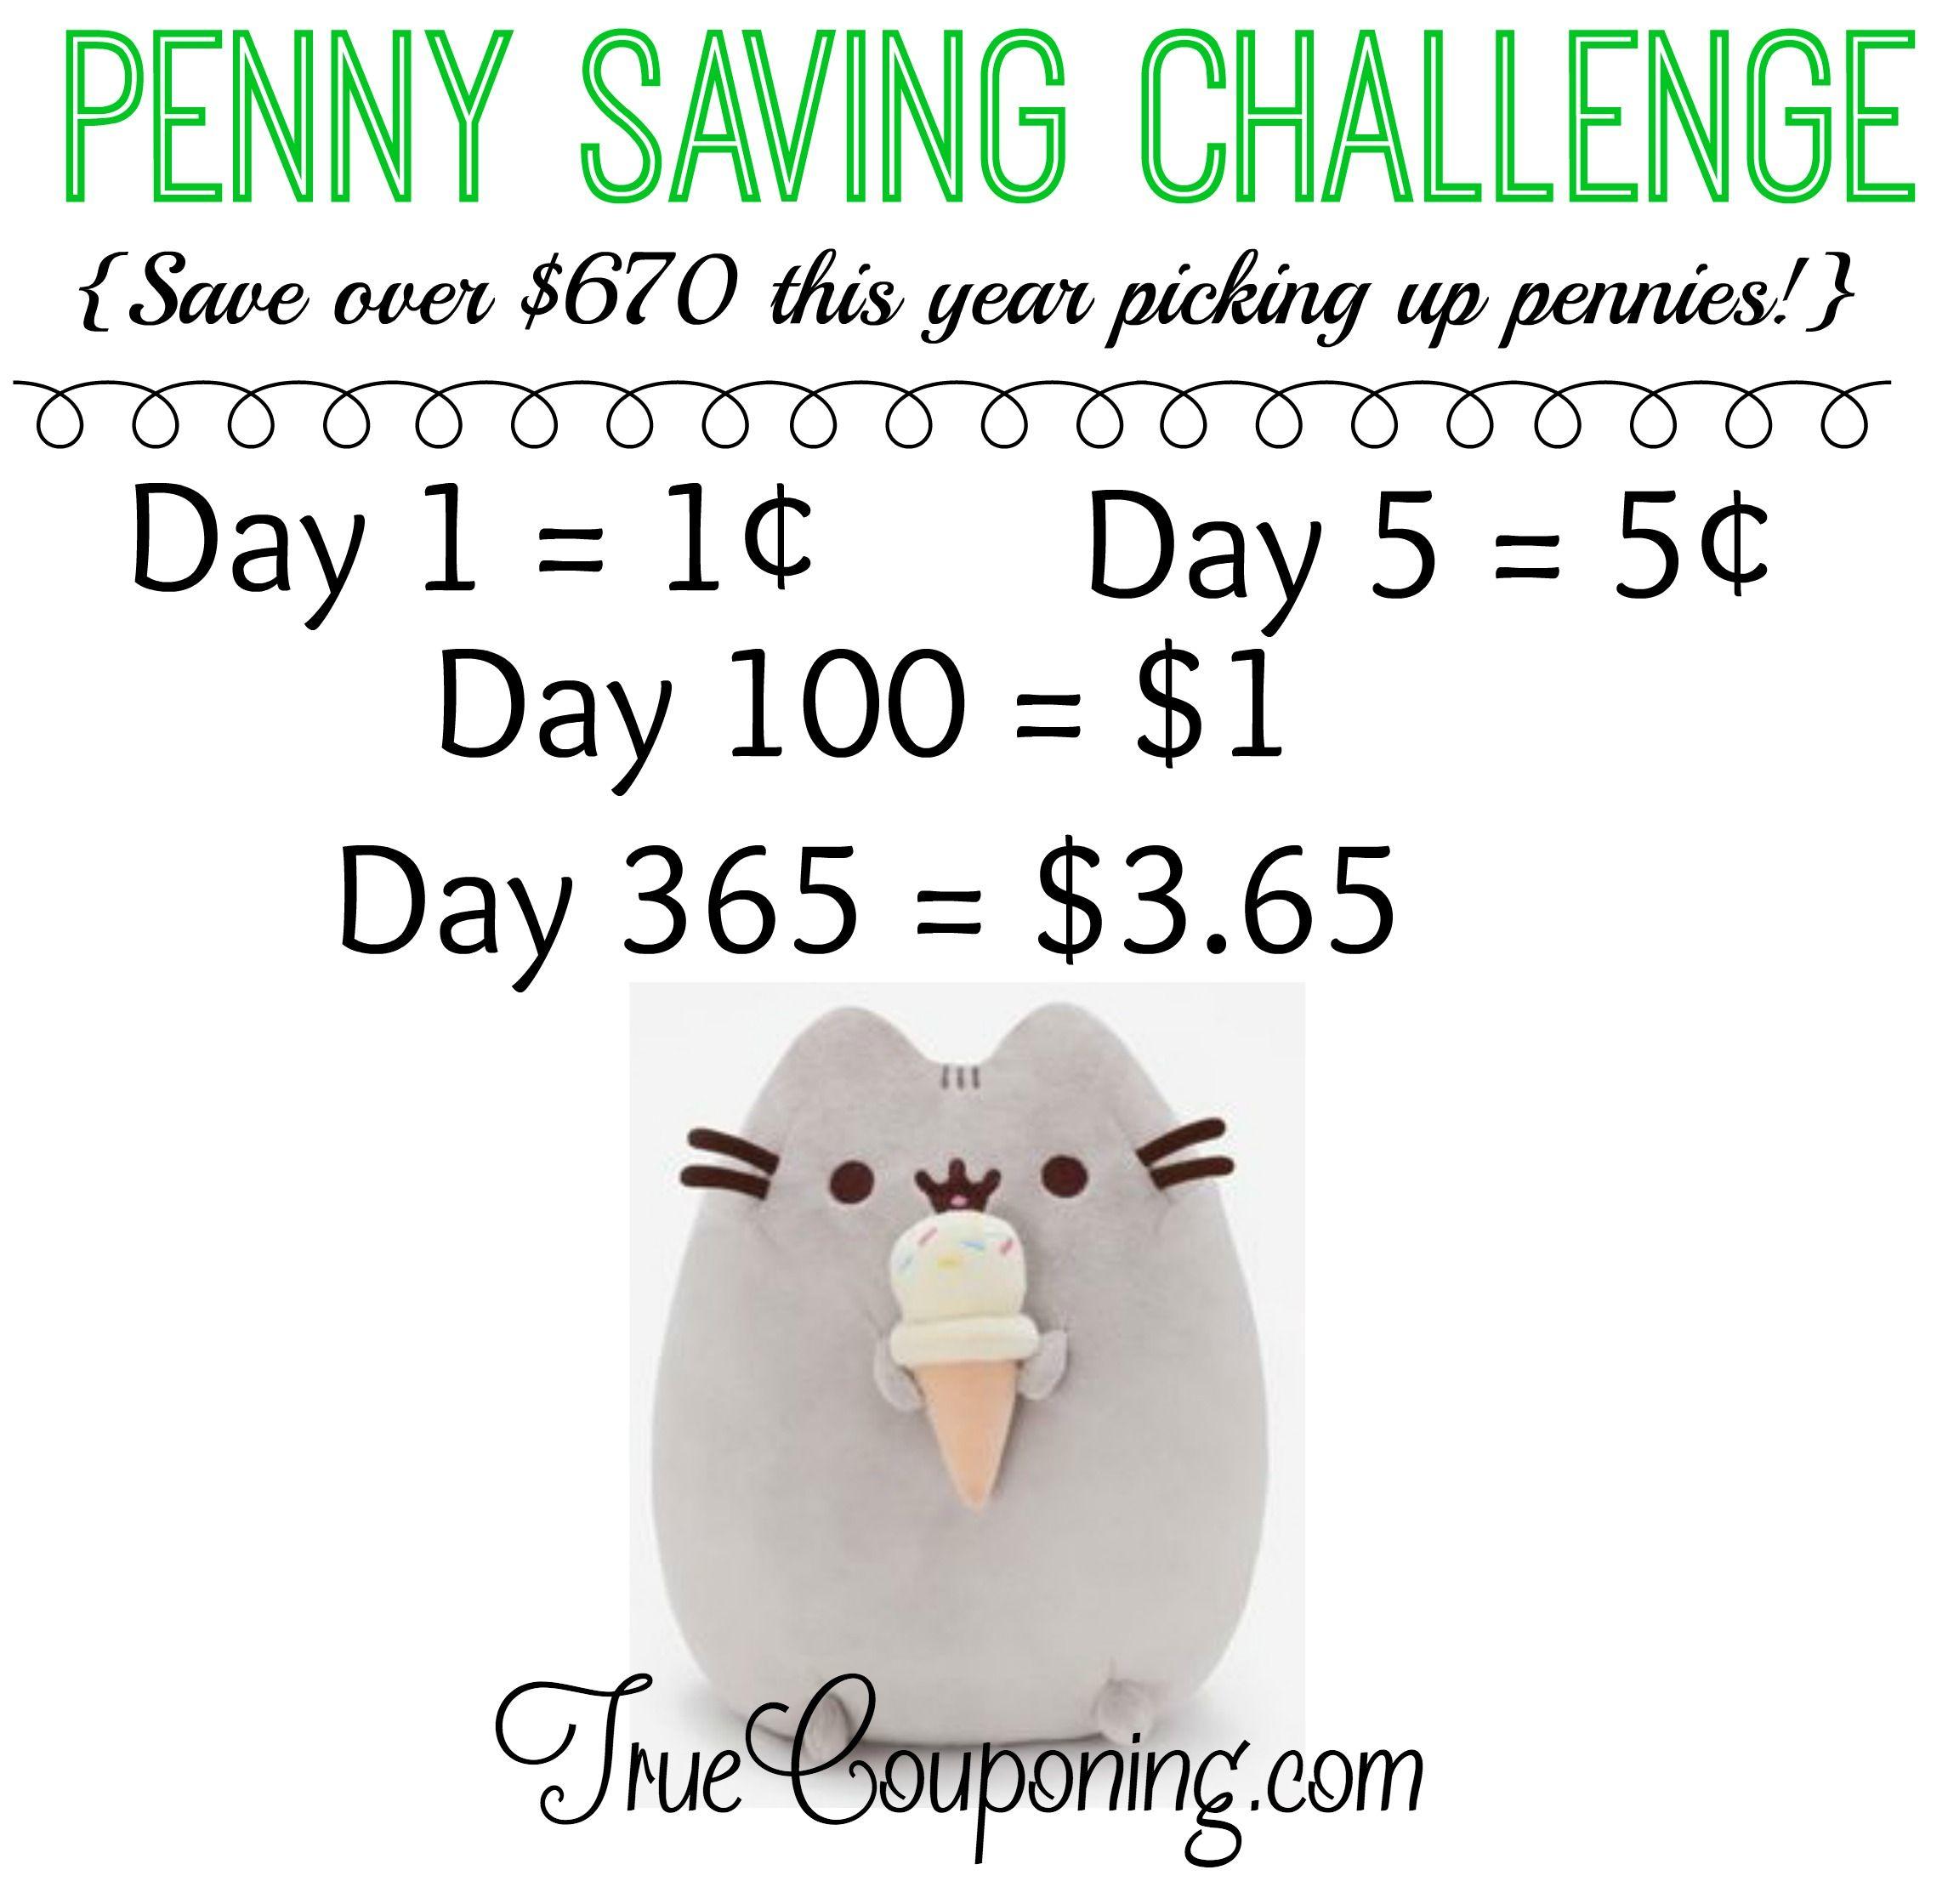 Penny Saving Challenge Jar Label